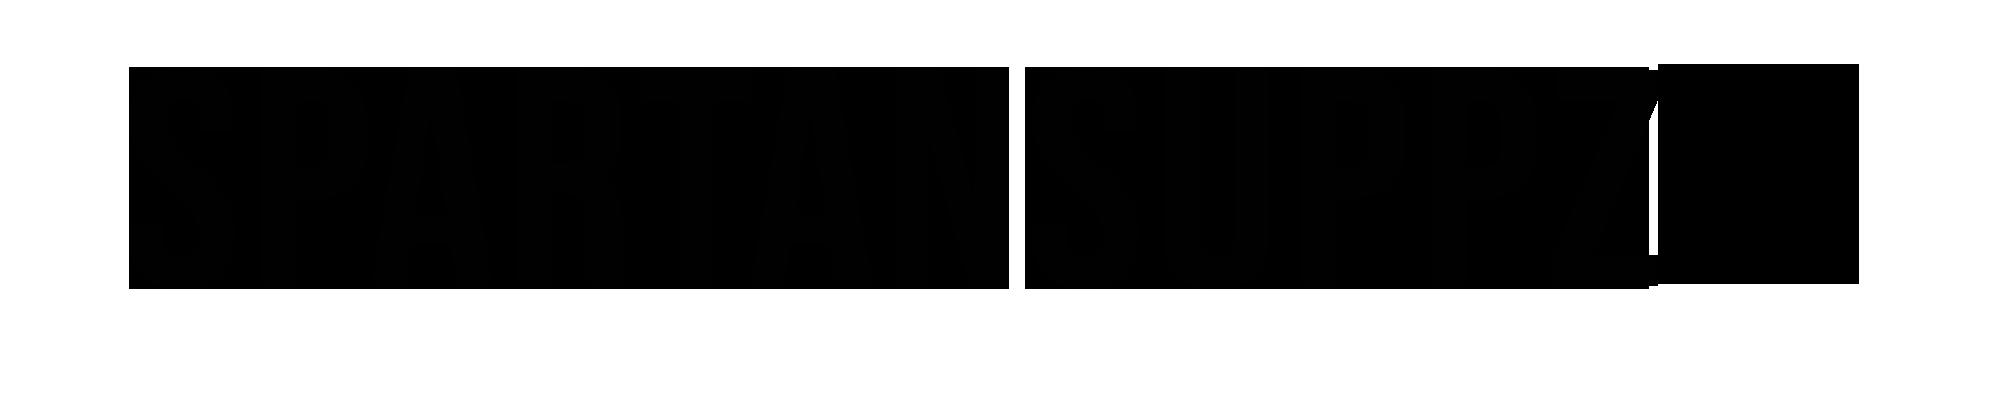 Support Portal logo